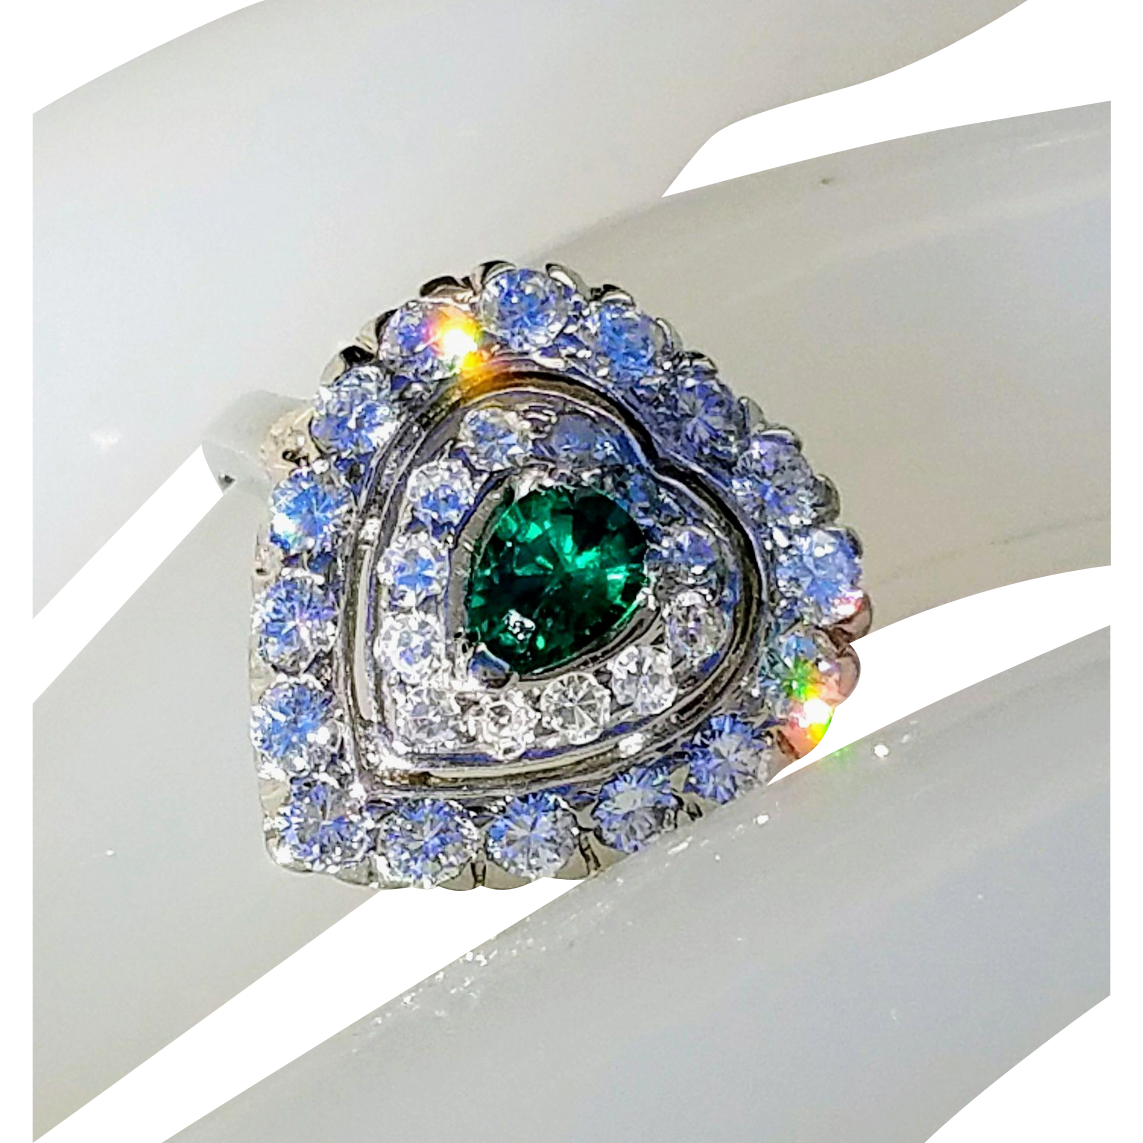 14K Heart-Shaped Diamond Emerald Art Deco Engagement Anniversary Ring 7